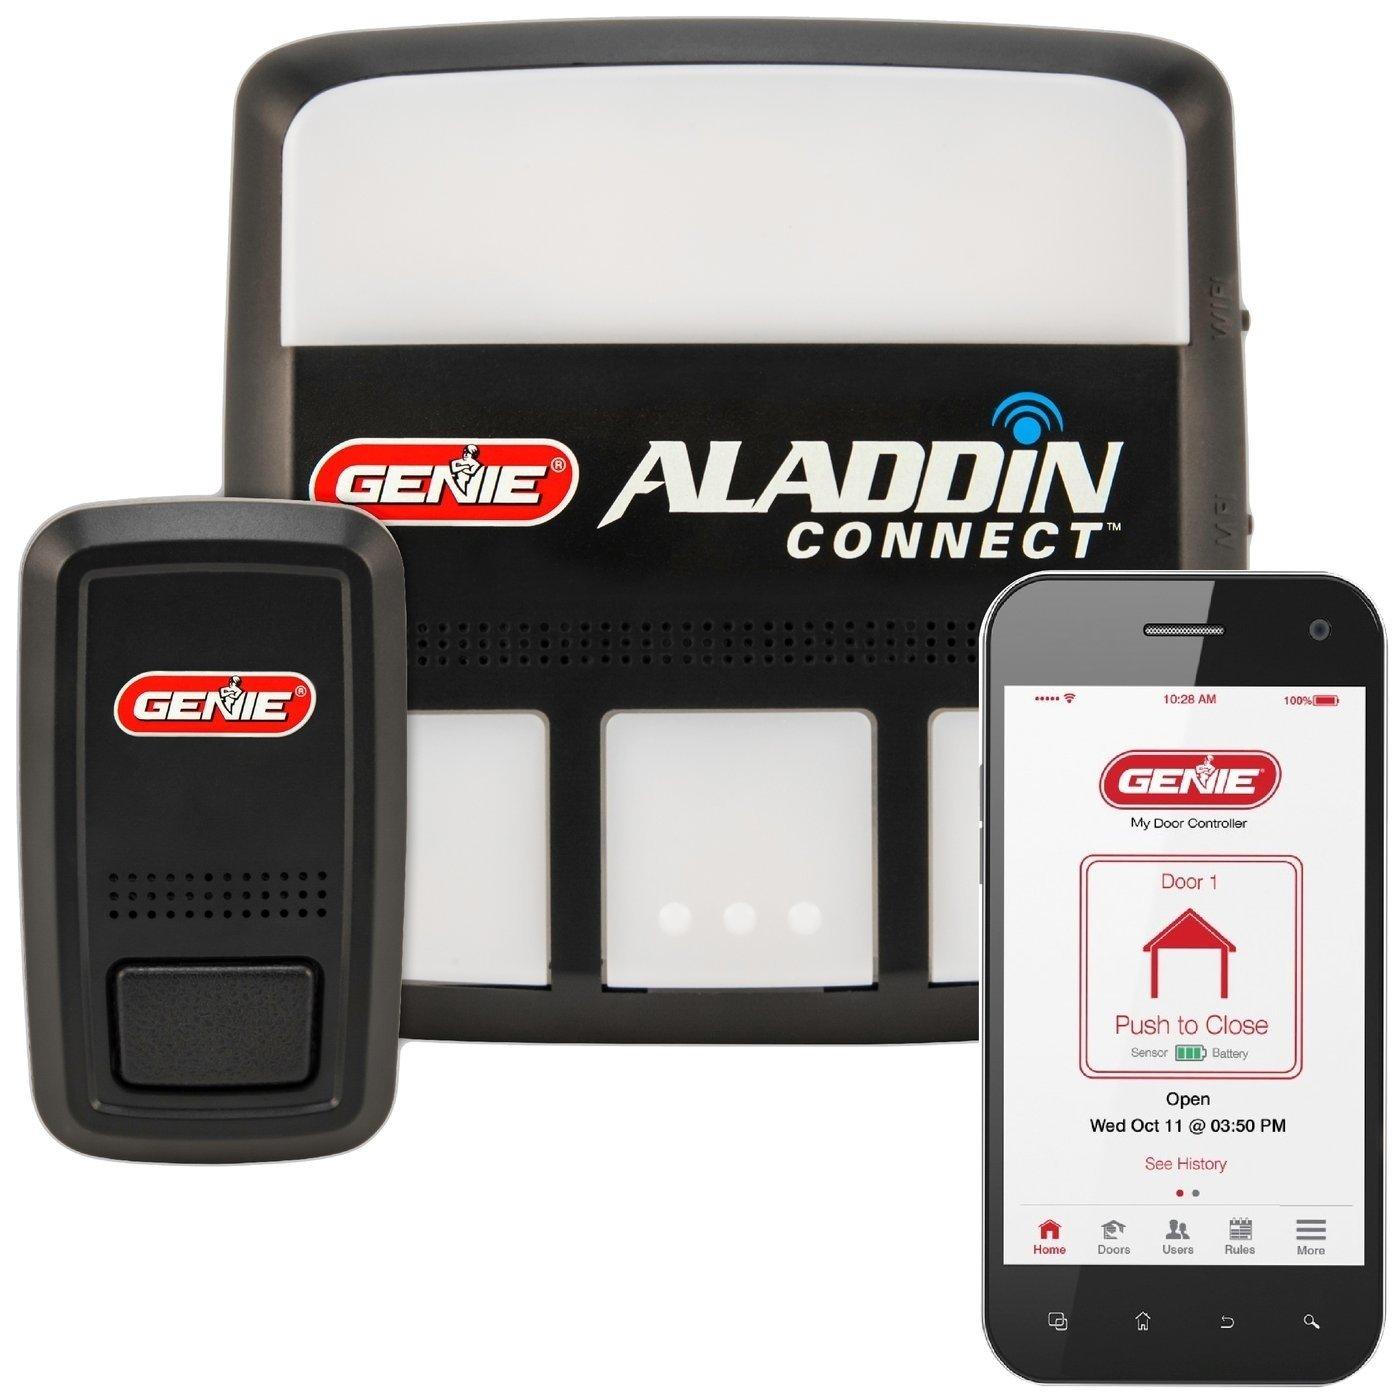 Aladdin Connect Wifi Garage Door Controller By Genie Retrofit Add On Unit For Existing Garage Do In 2020 Garage Door Controller Smart Garage Door Opener Garage Doors